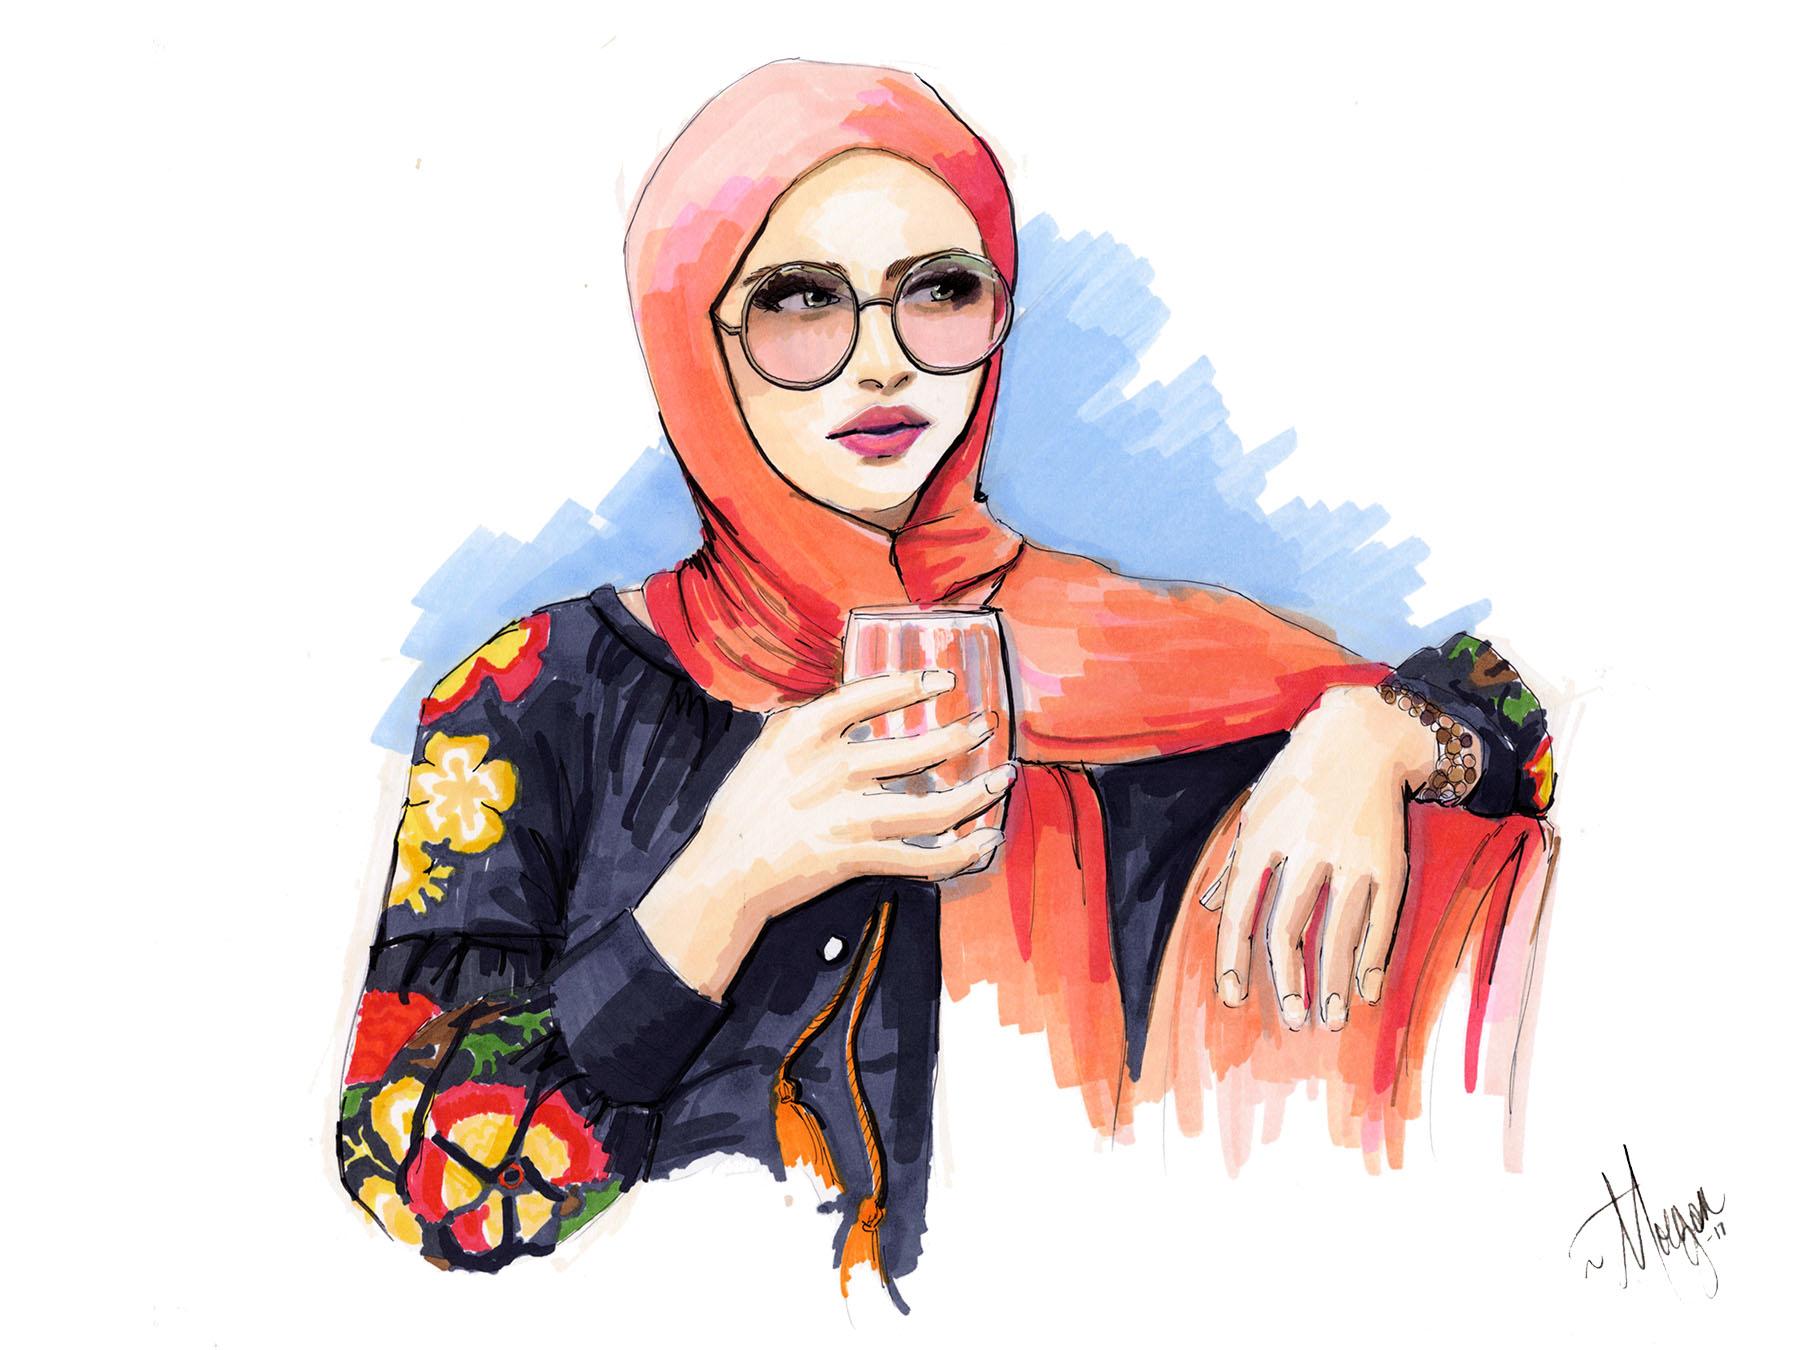 hijab-fashion-morgan-swank-illustration.jpg